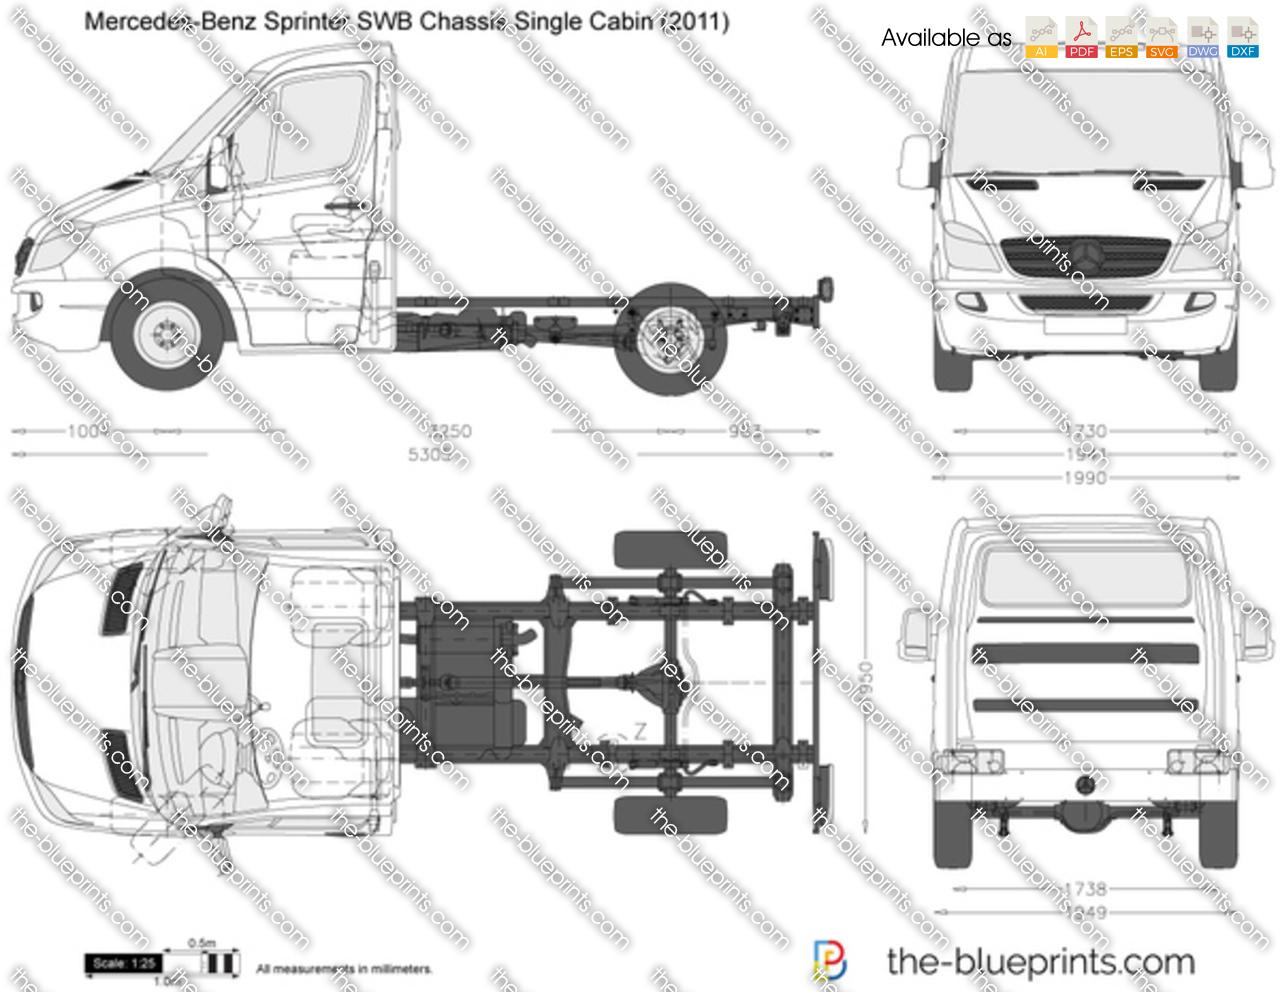 Mercedes benz sprinter swb chassis single cabin vector drawing for Mercedes benz sprinter chassis